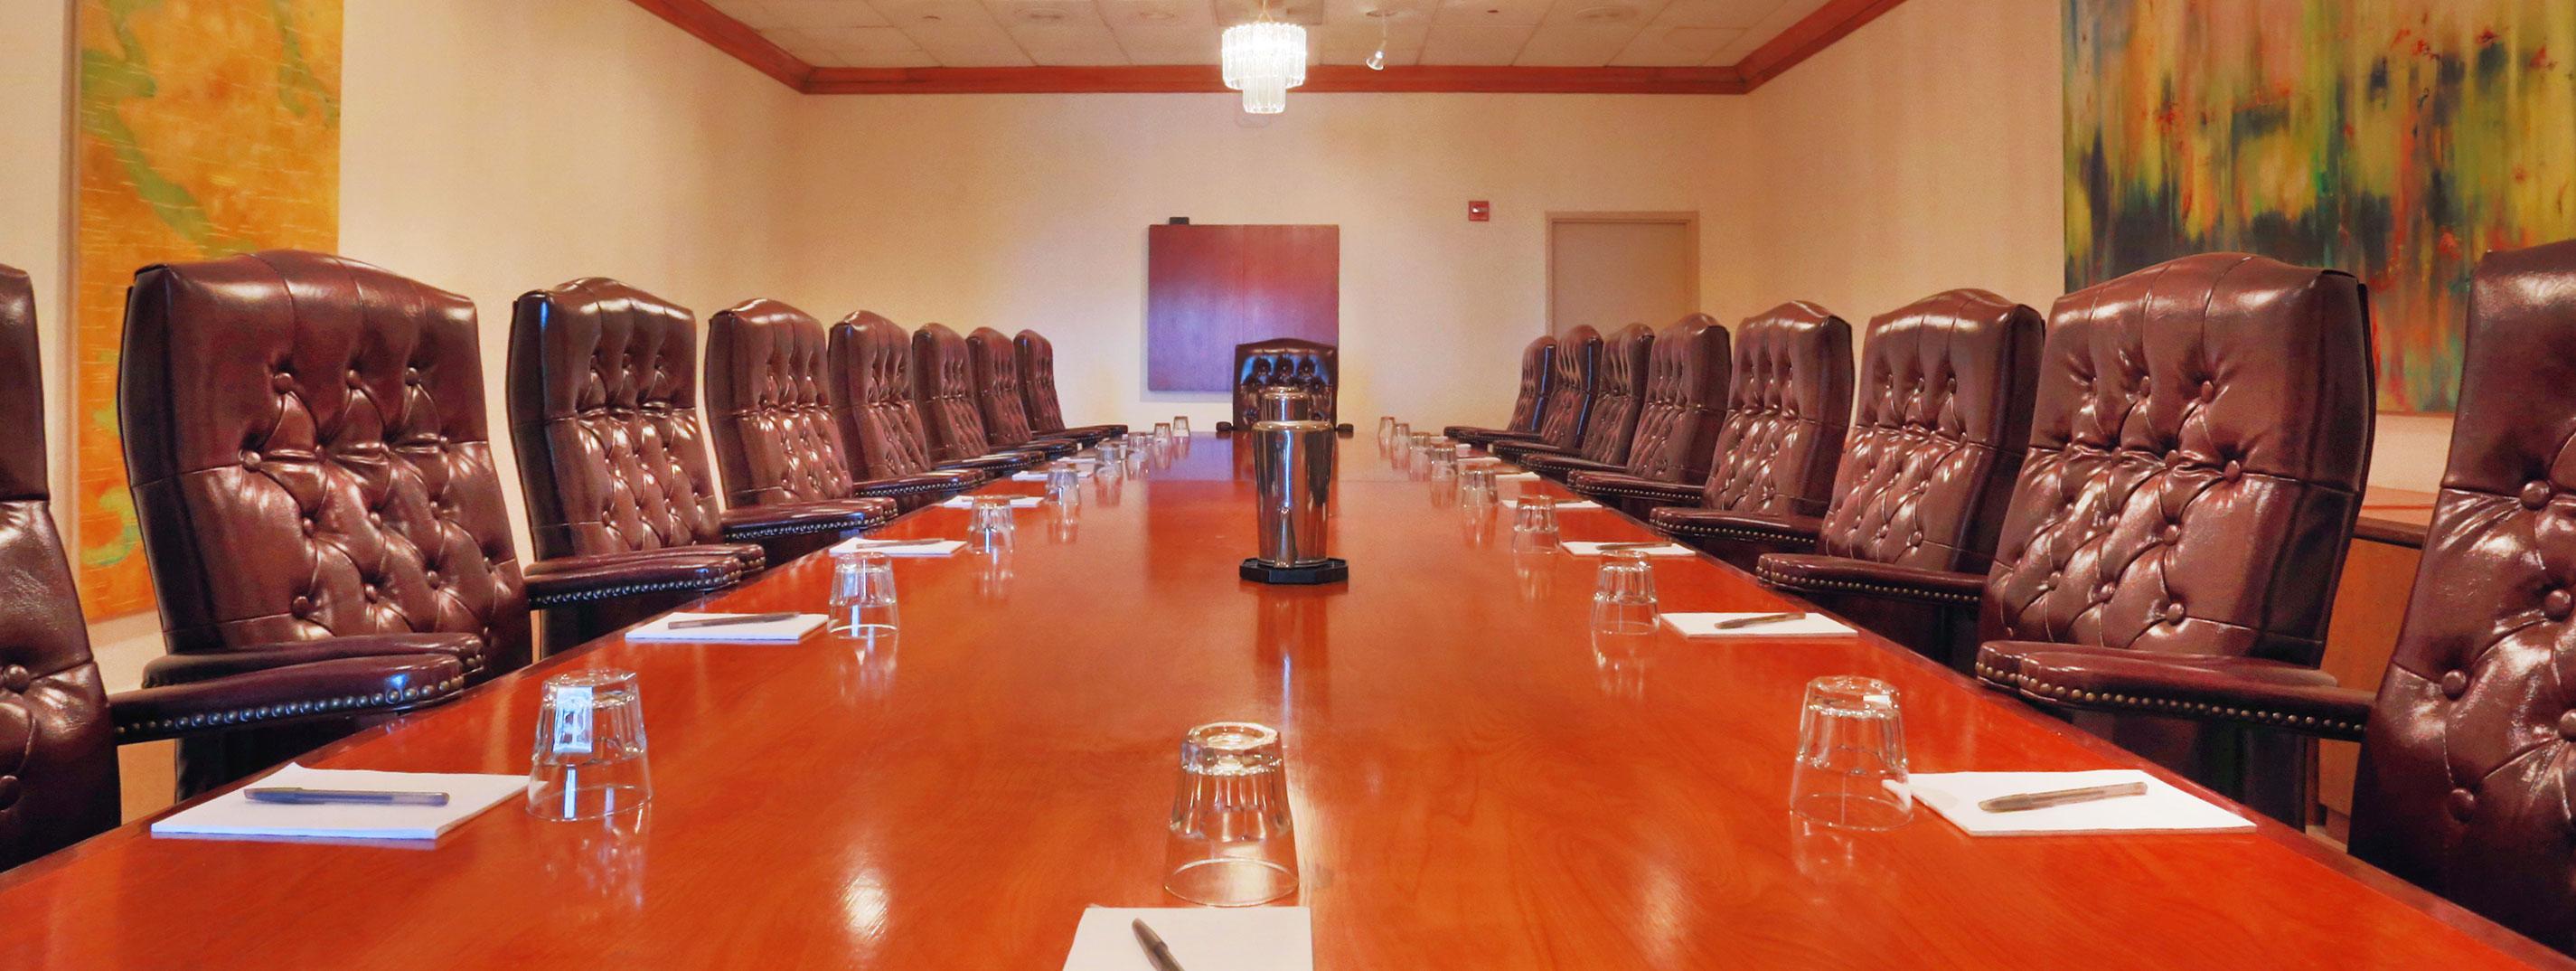 Davidson Boardroom Meetings Deauville Beach Resort